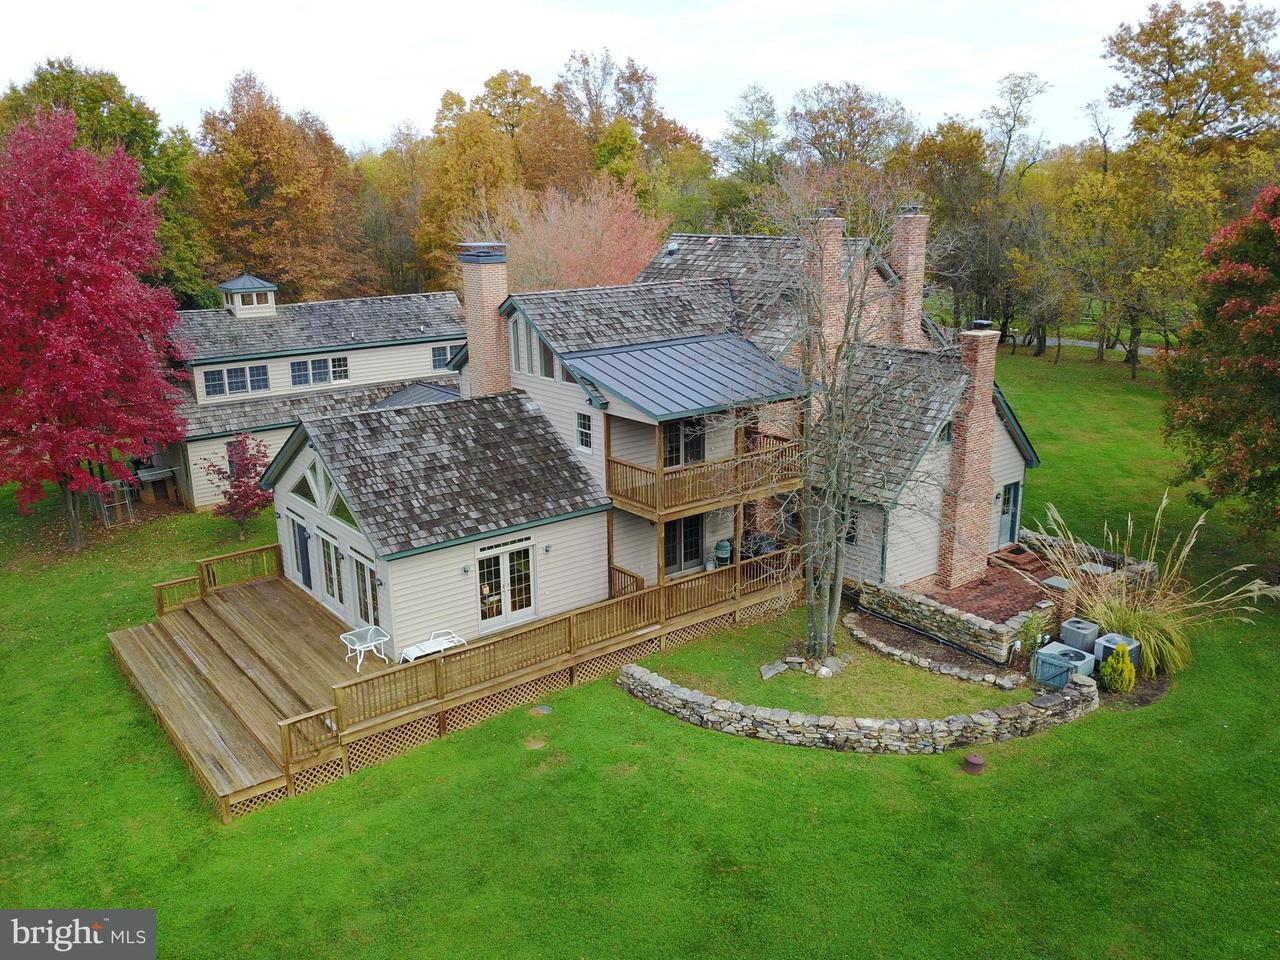 獨棟家庭住宅 為 出售 在 20141 COLCHESTER Road 20141 COLCHESTER Road Purcellville, 弗吉尼亞州 20132 美國